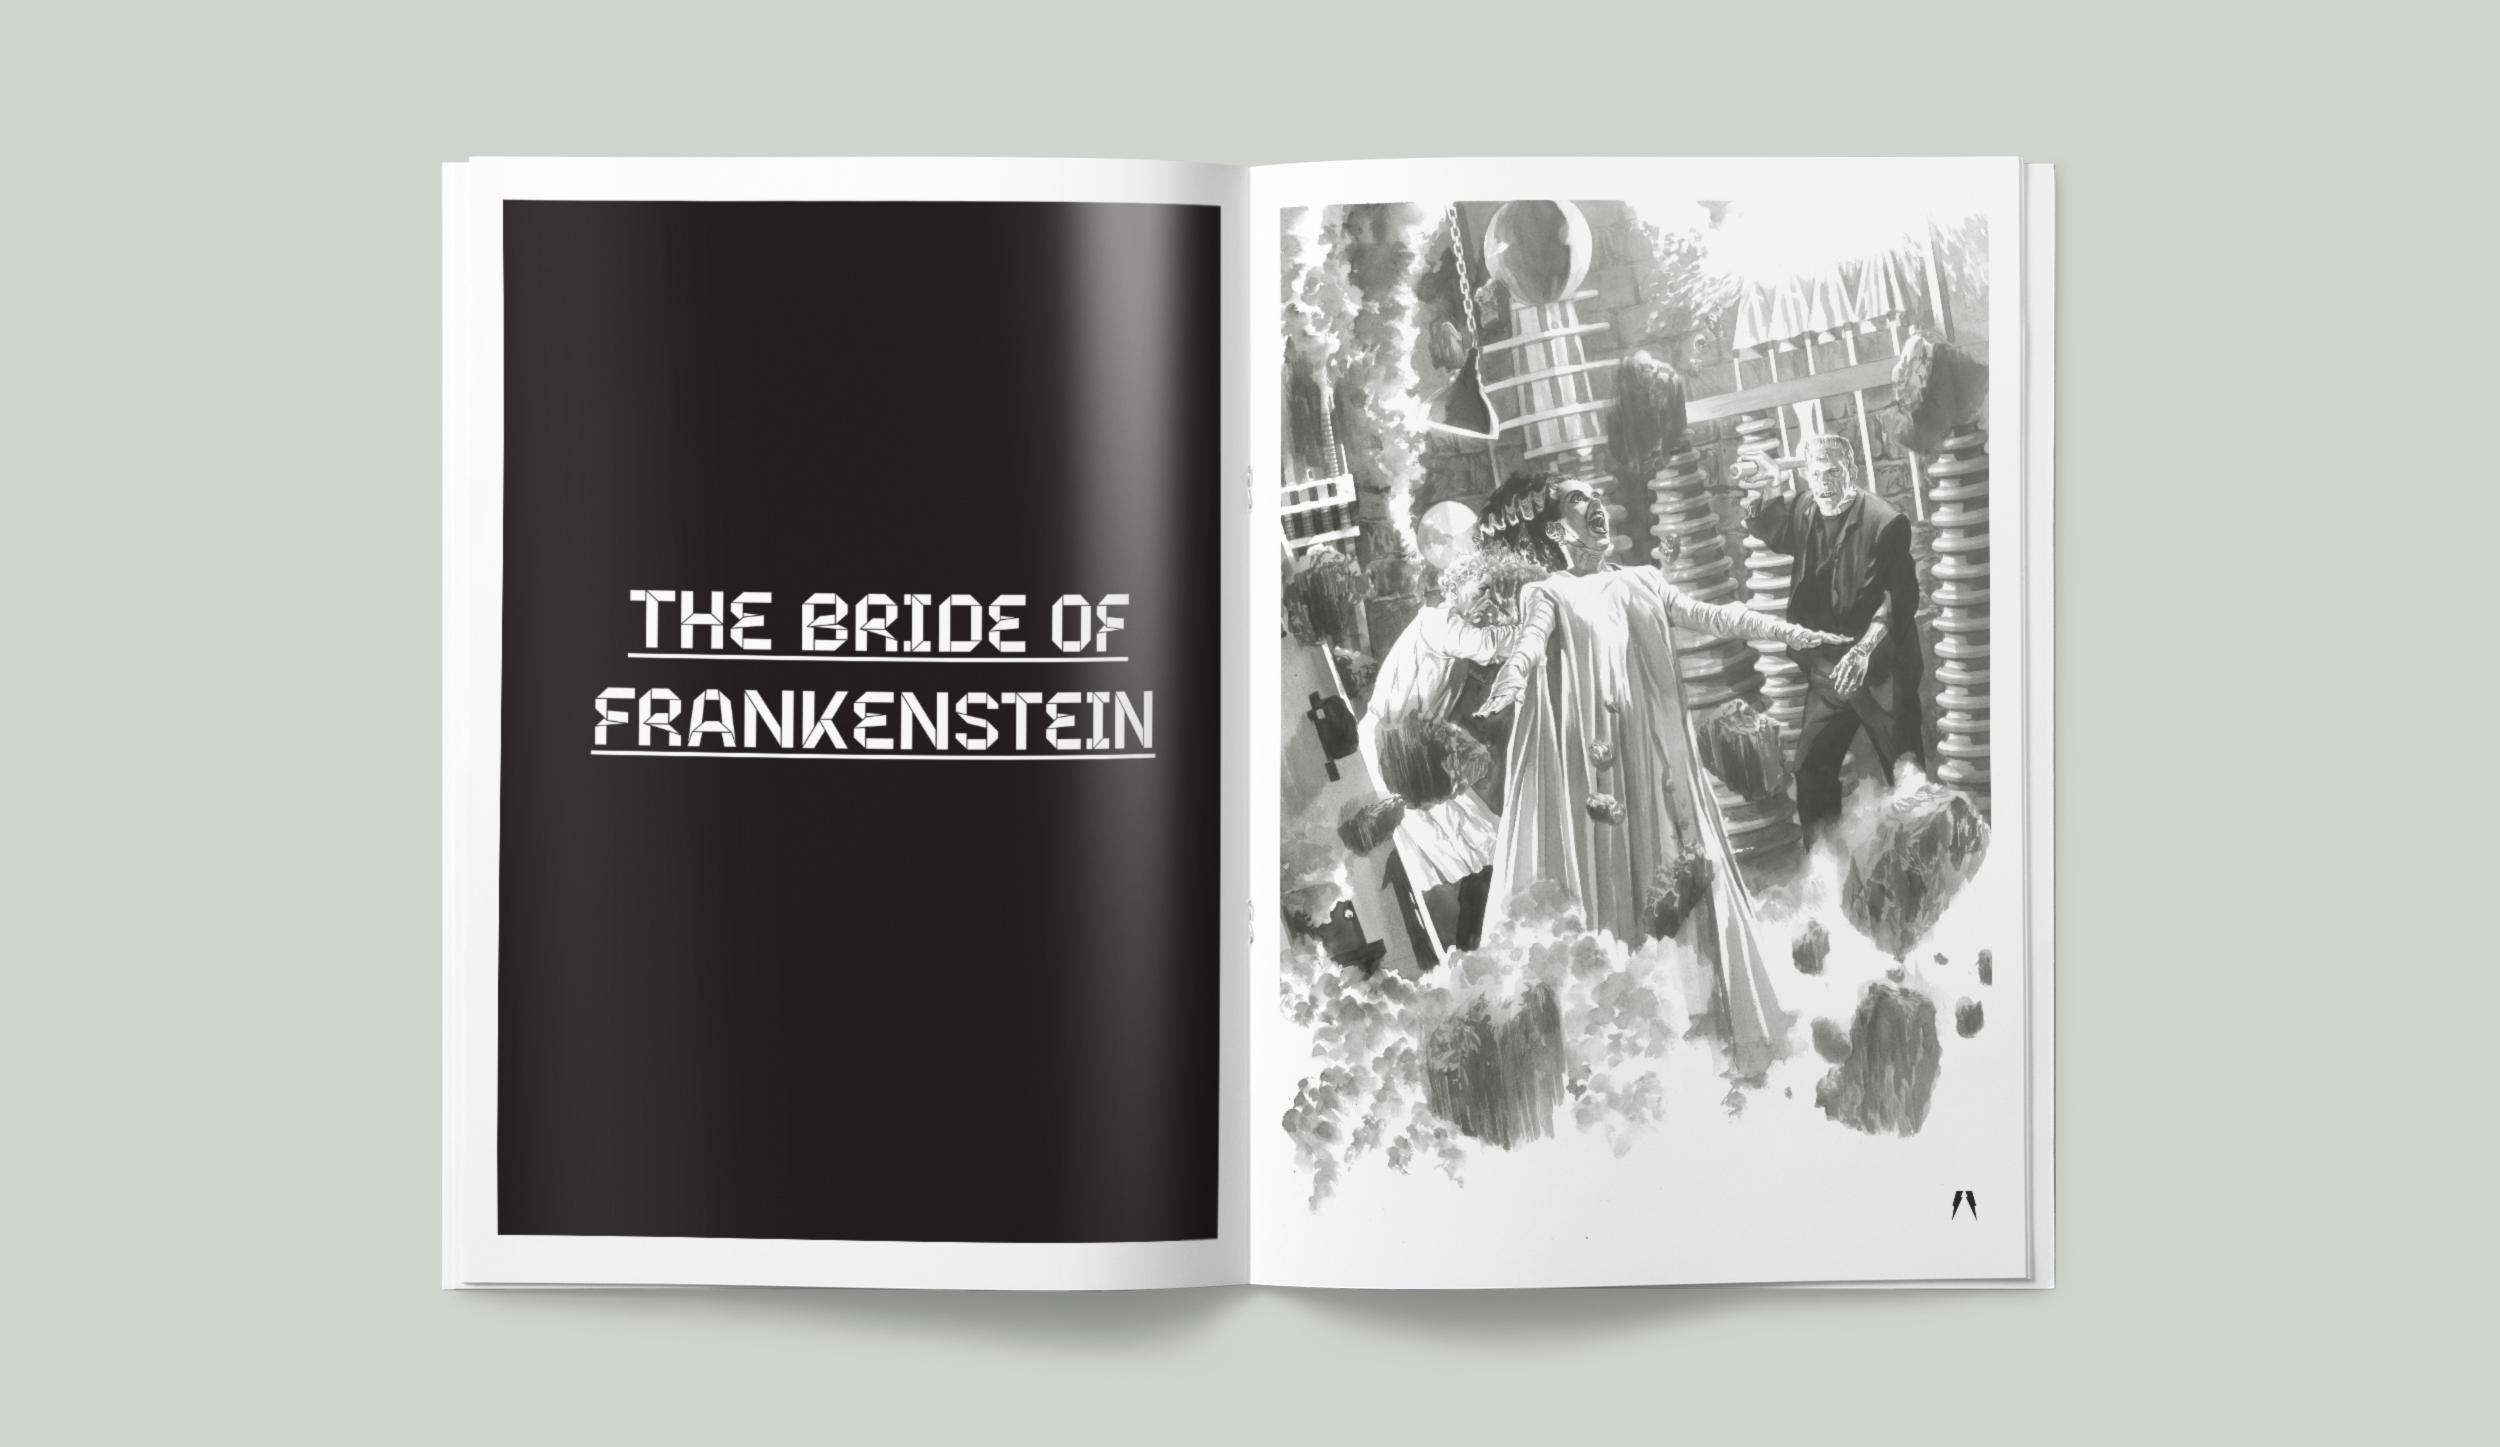 Universal Monsters. The Bride of Frankenstein.